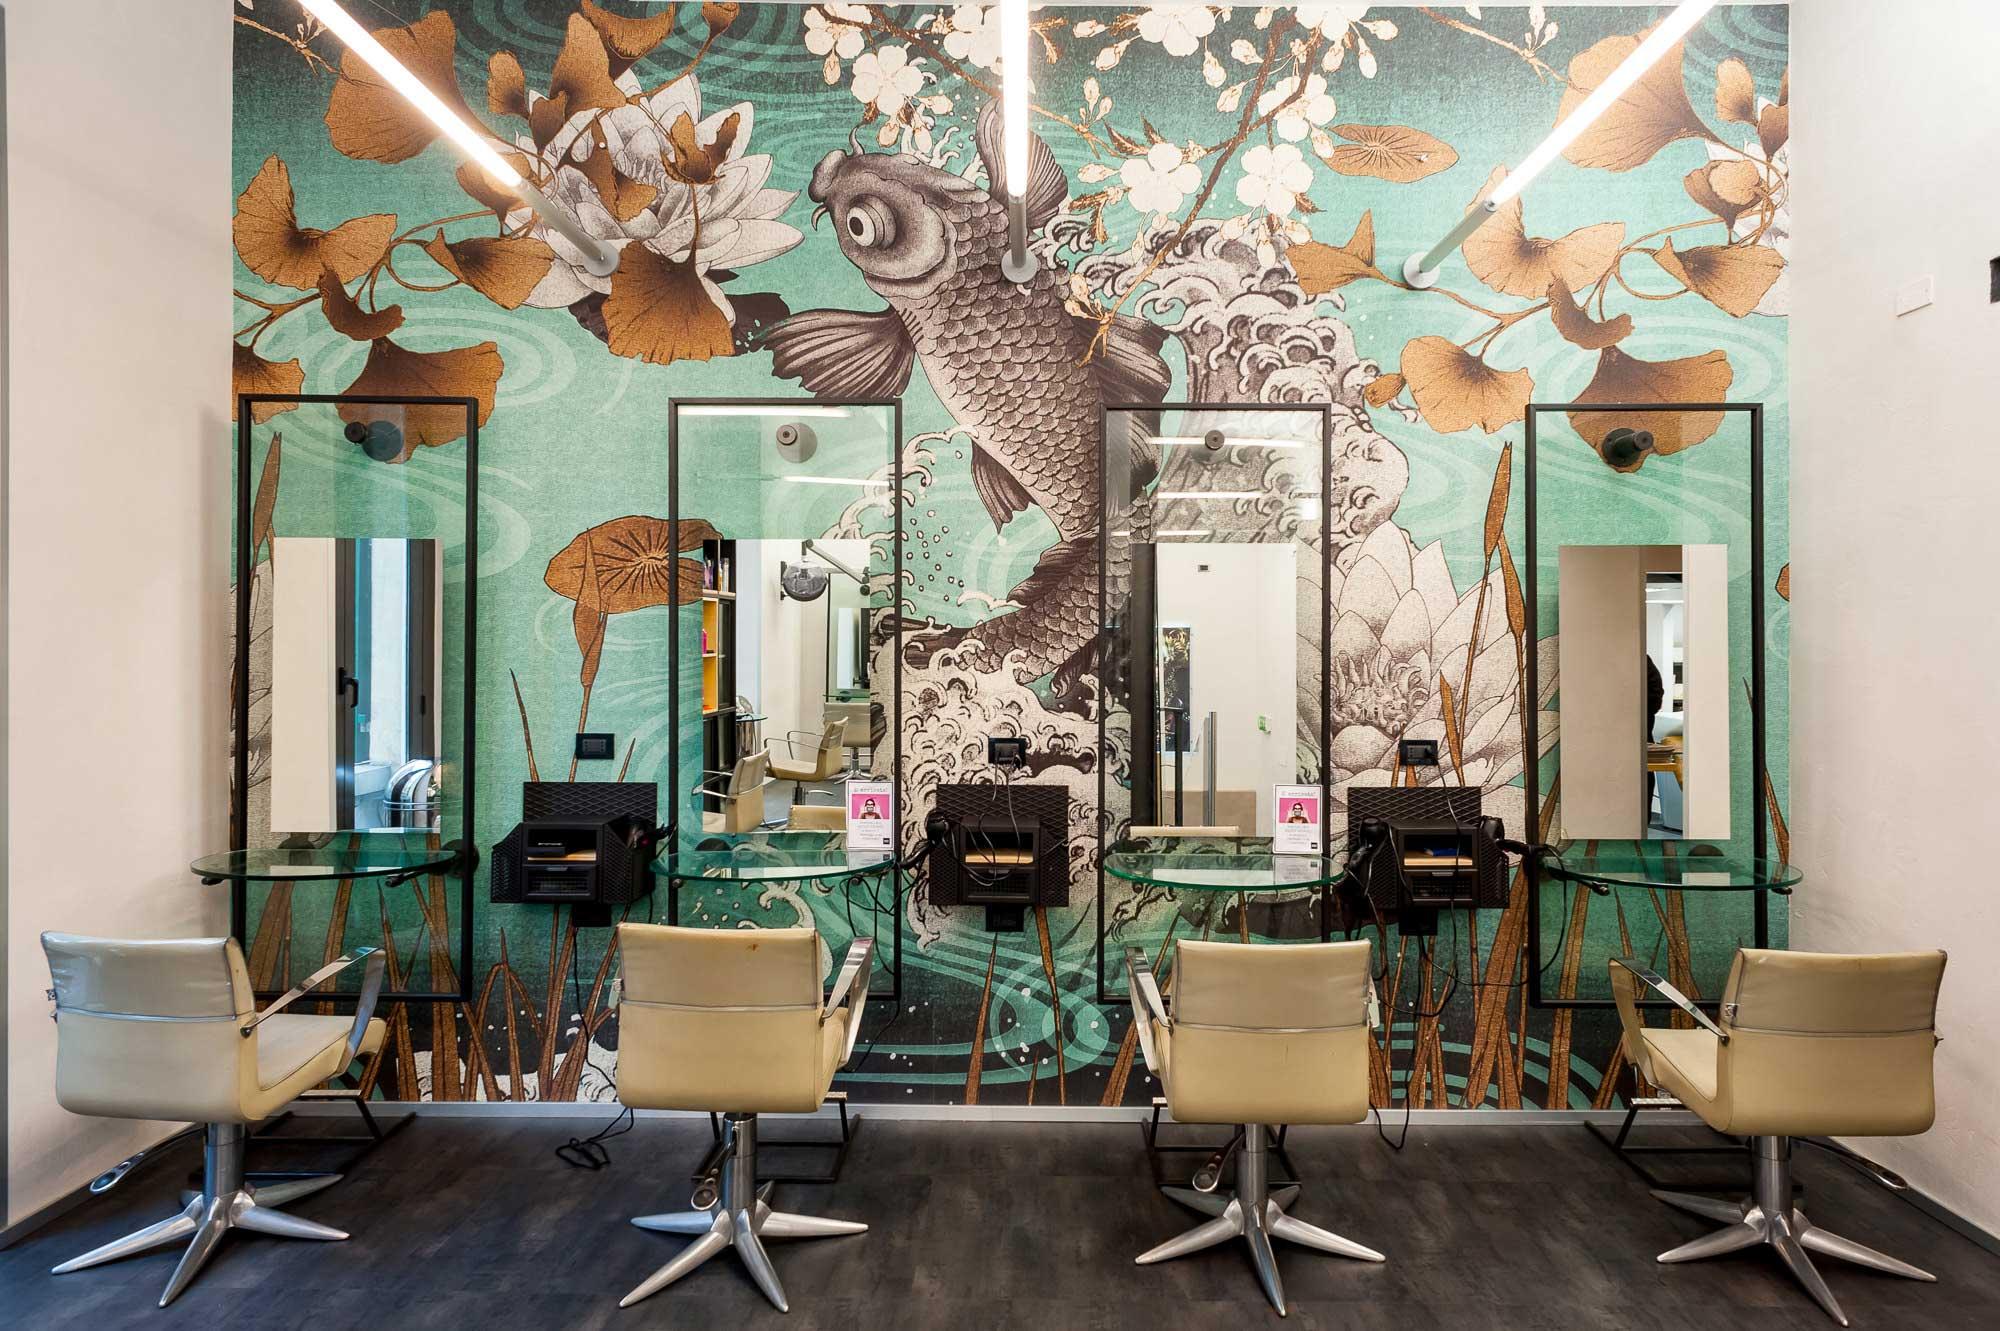 Equipe giorgio arredamento per parrucchieri salone di for Arredamento per parrucchieri